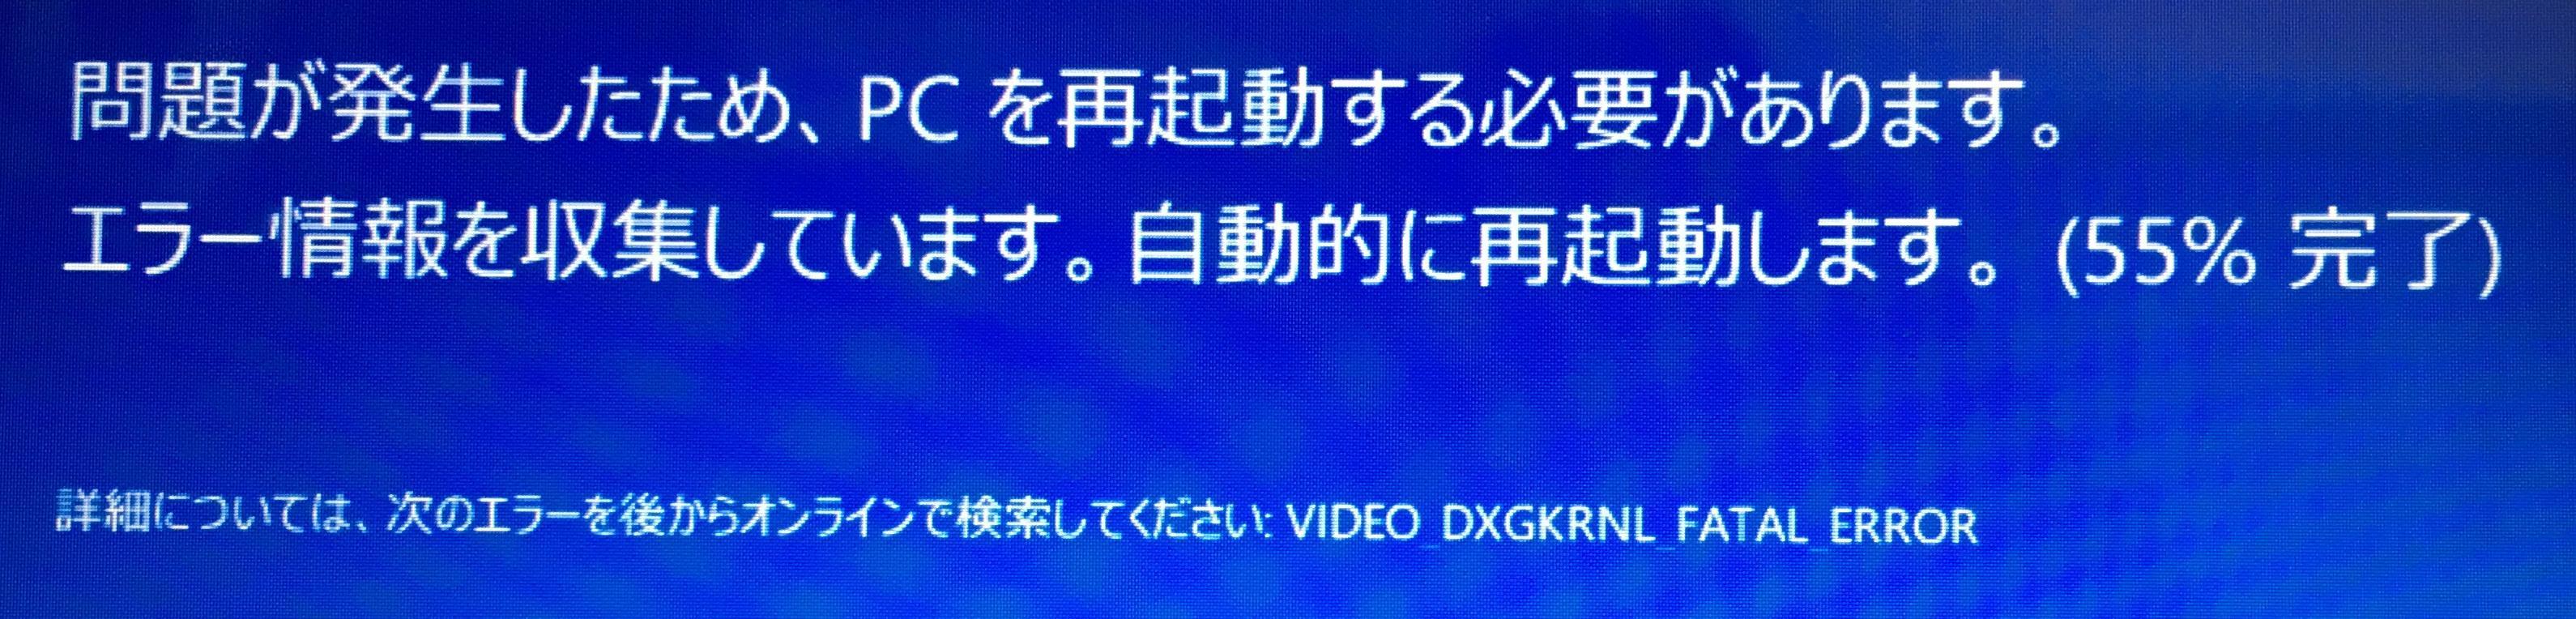 VIDEO_DXGKRNL_FATAL_ERROR.jpg